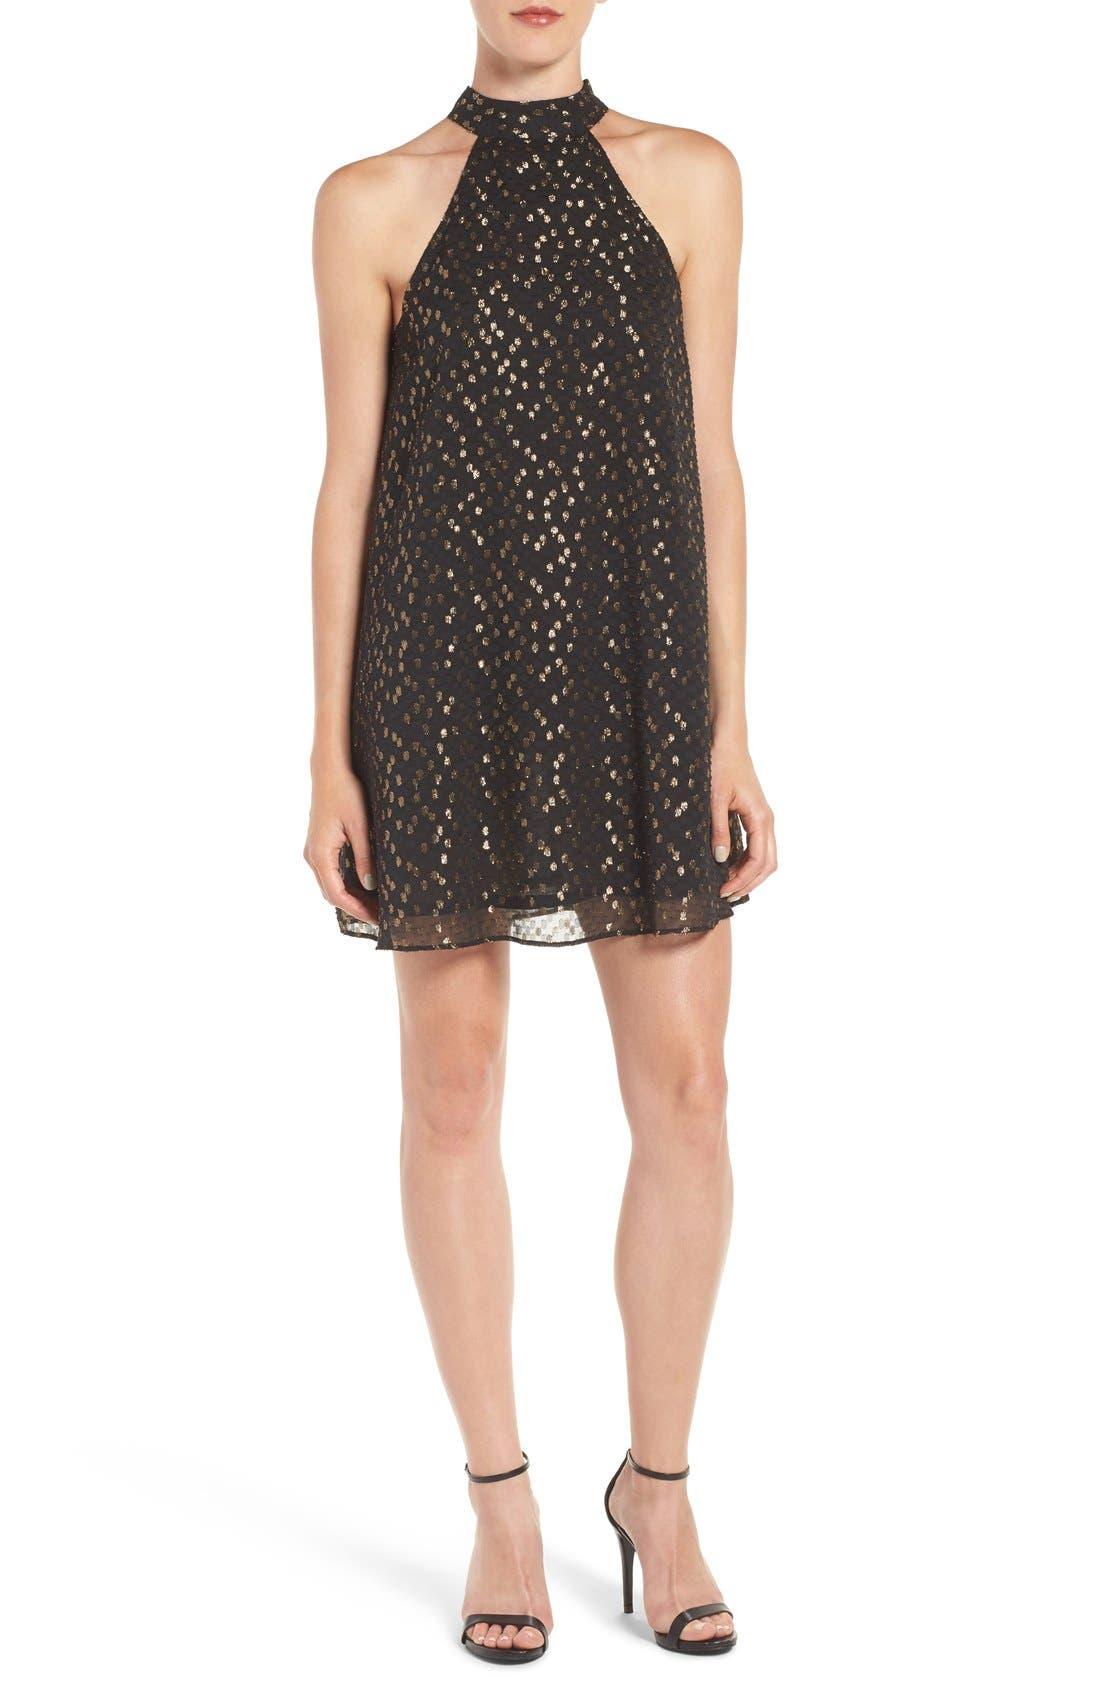 Main Image - Chelsea28 Metallic Halter Dress